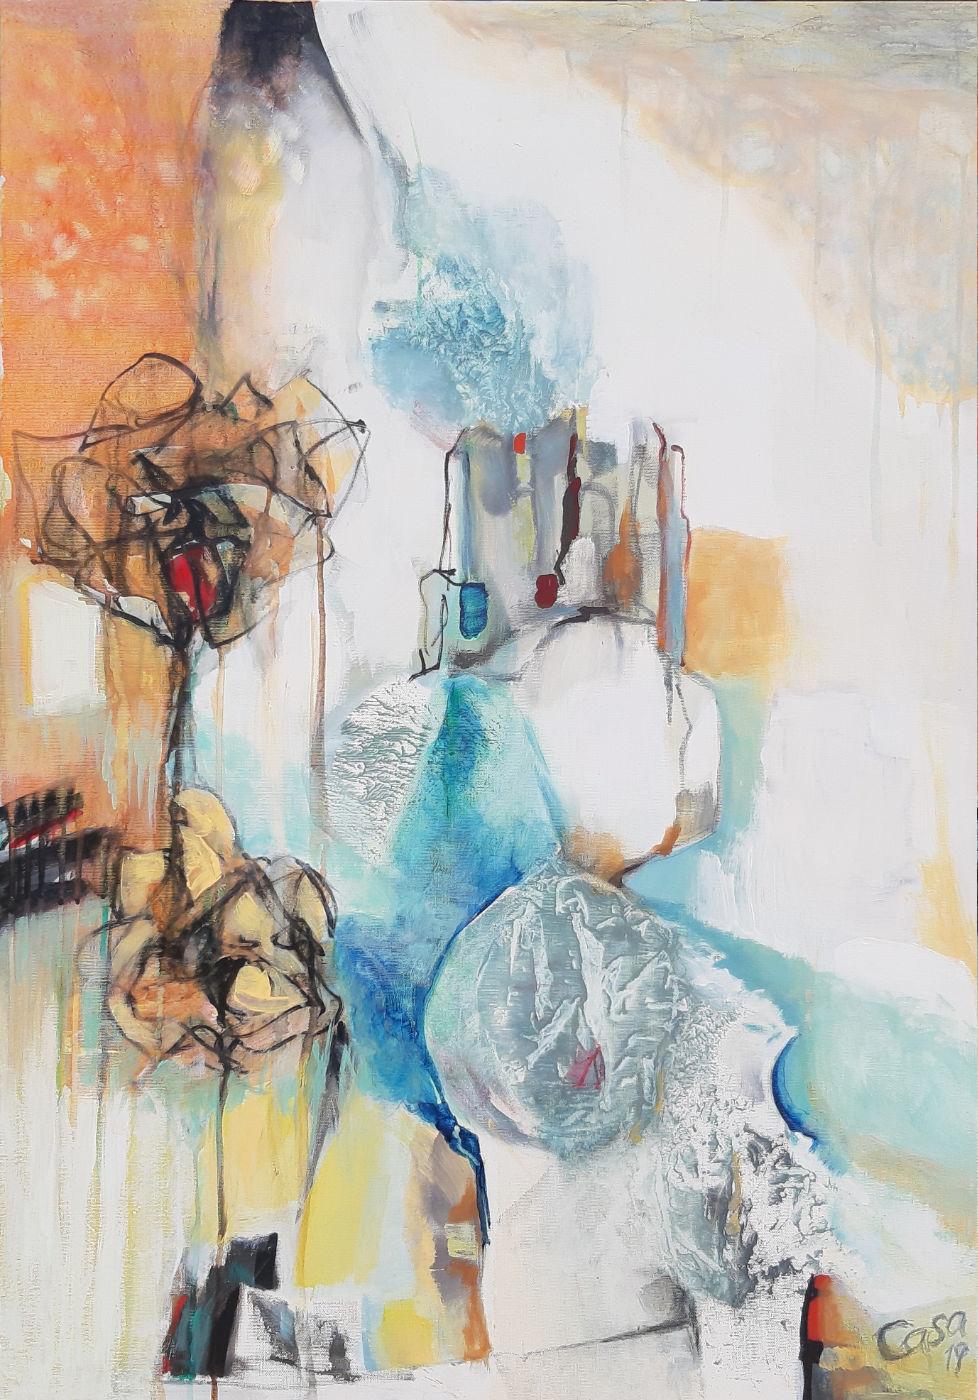 Eins - Acryl, mixed media auf Leinwand, 100 x 70 cm